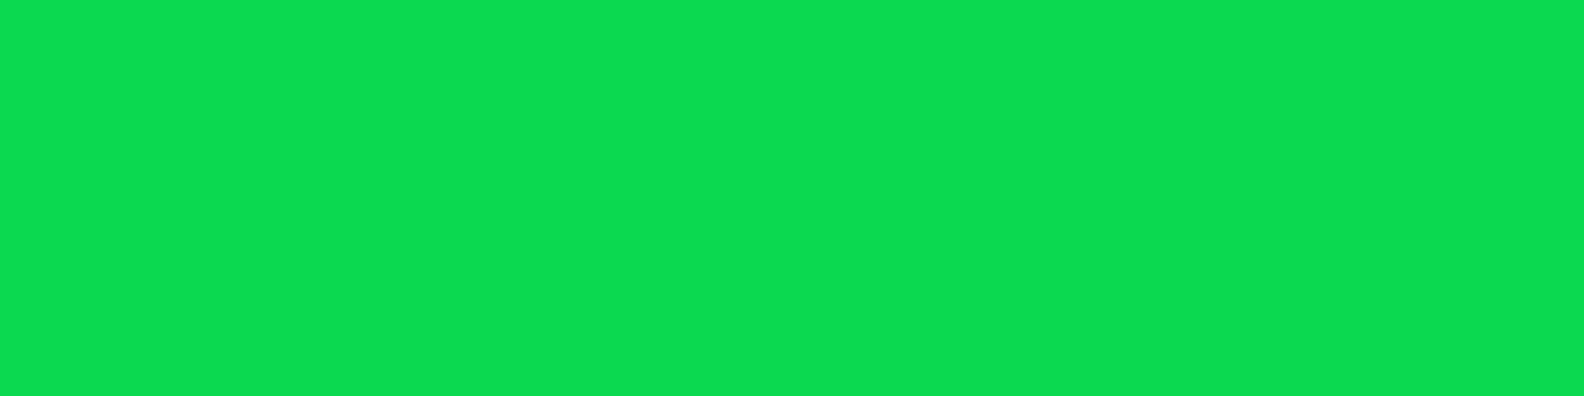 1584x396 Malachite Solid Color Background